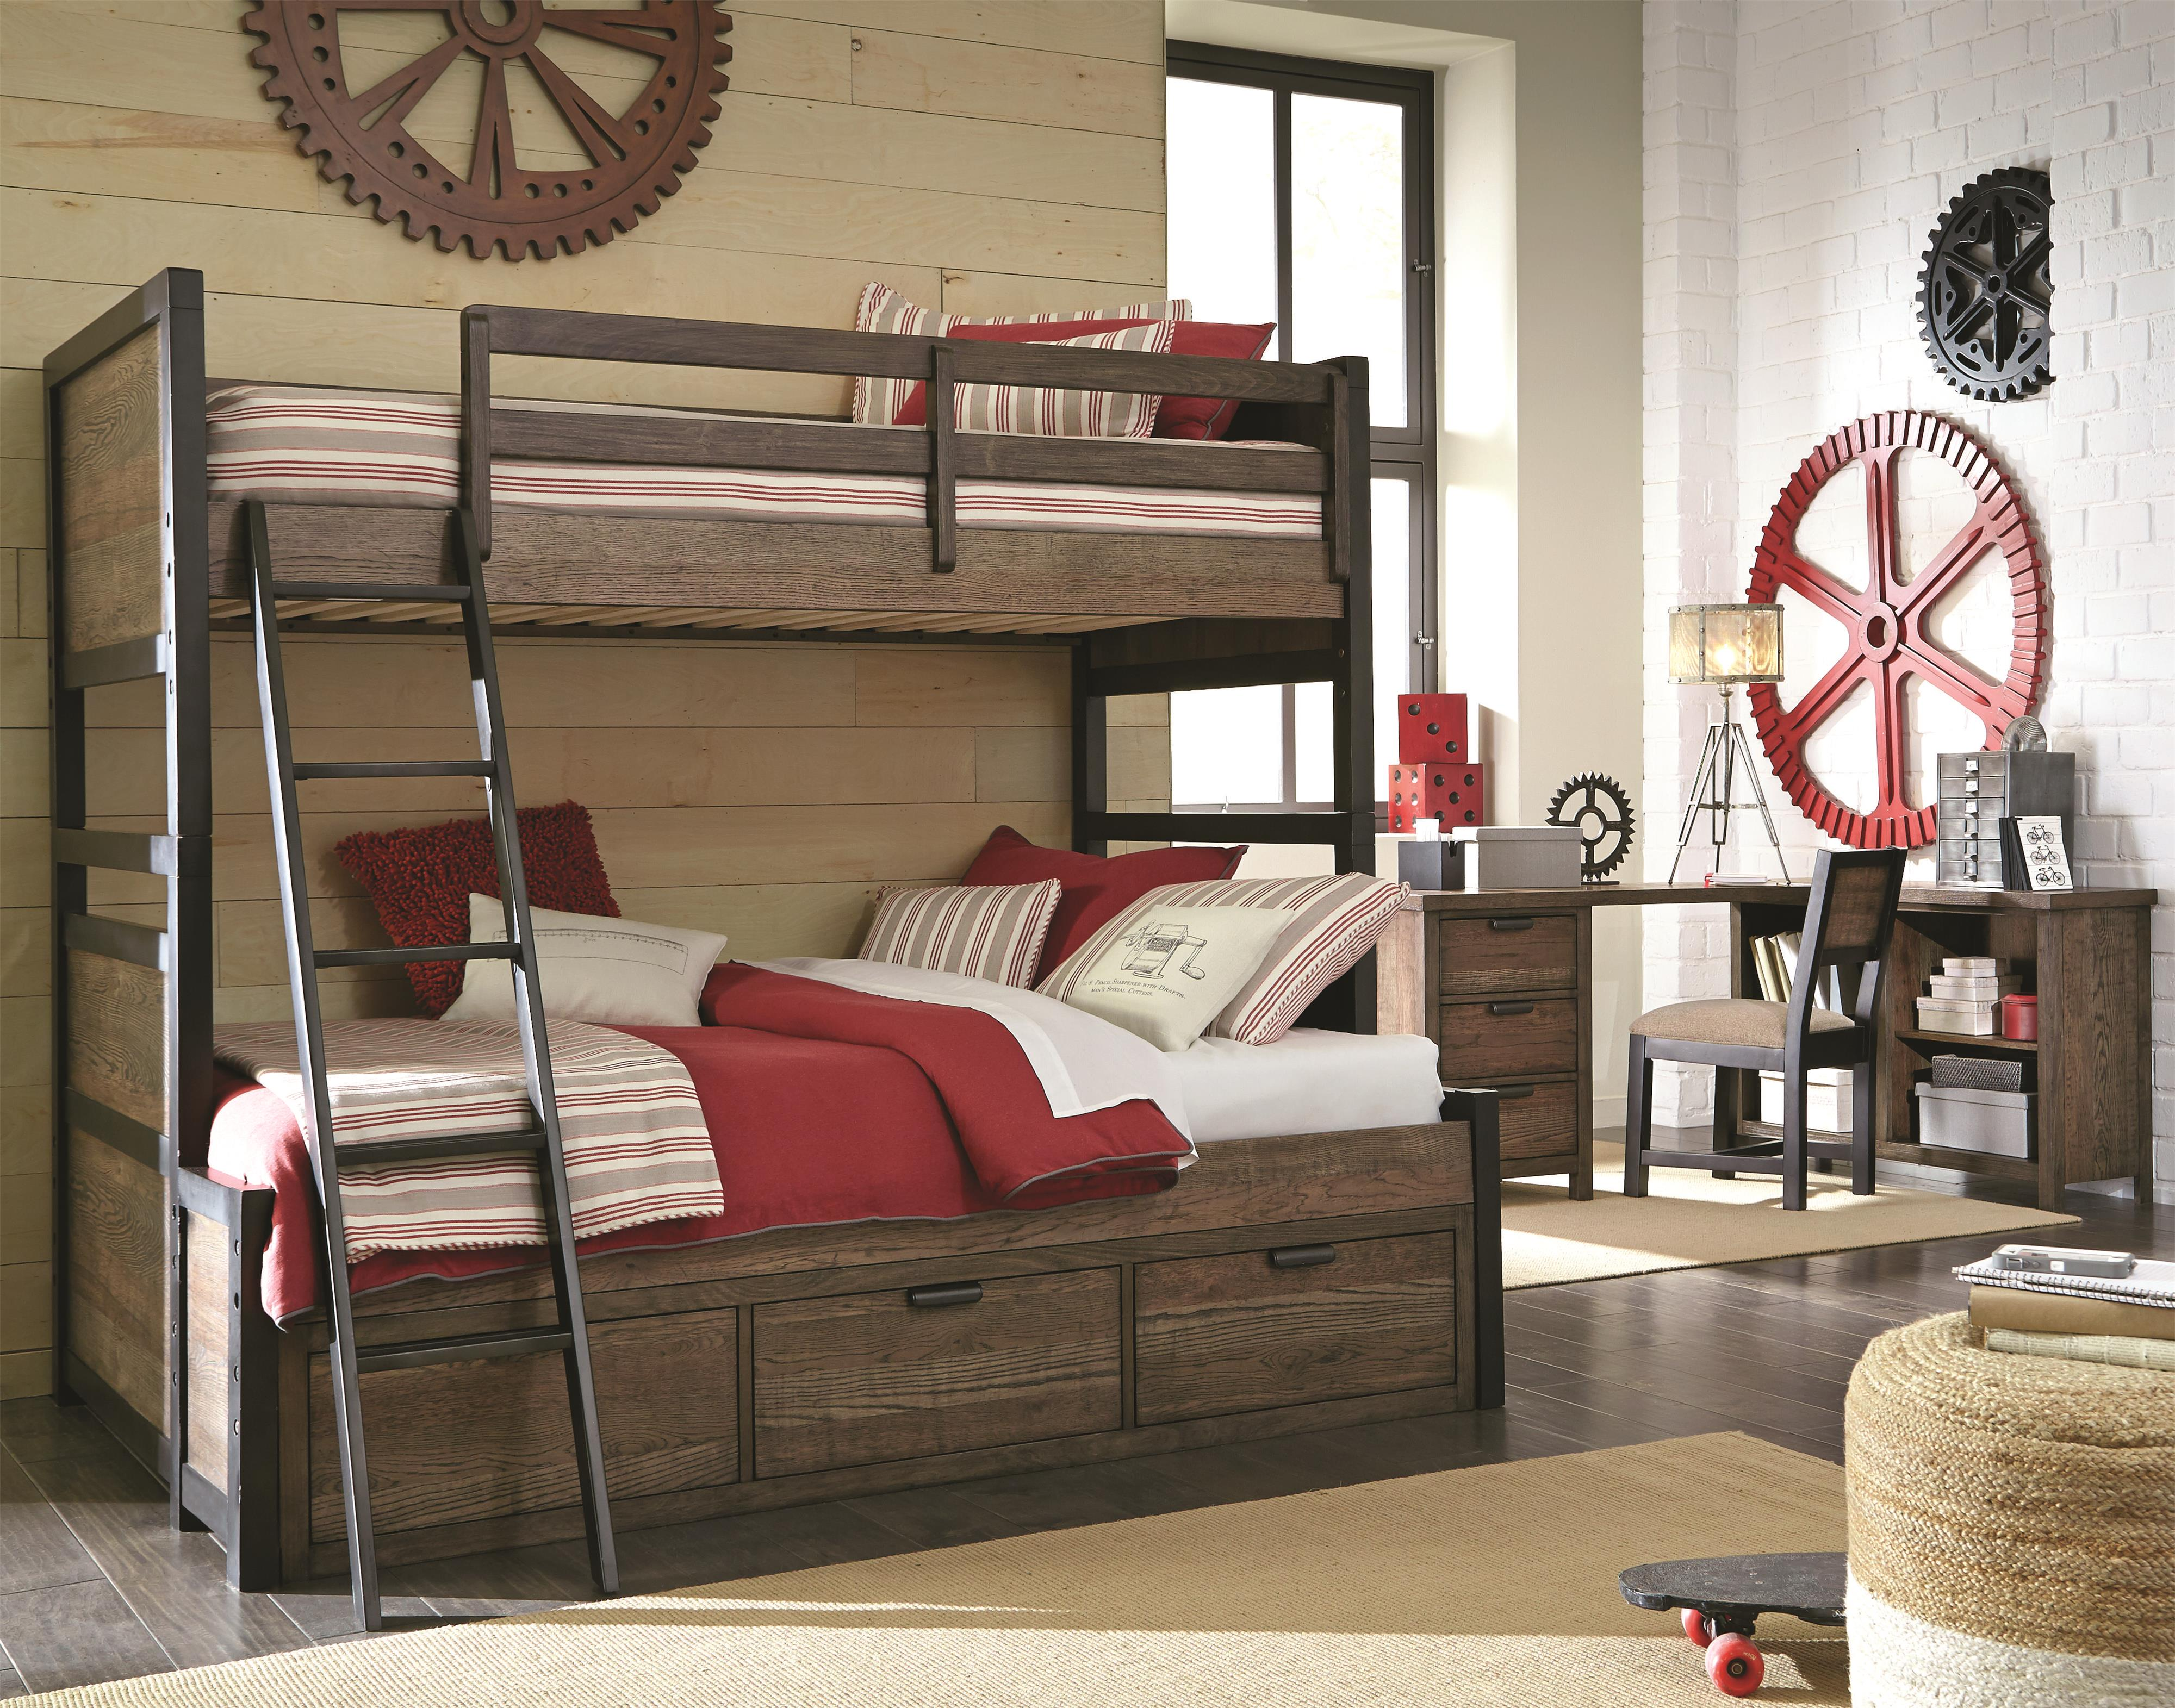 Bunk Beds Shop Kids Beds Wolf And Gardiner Wolf Furniture